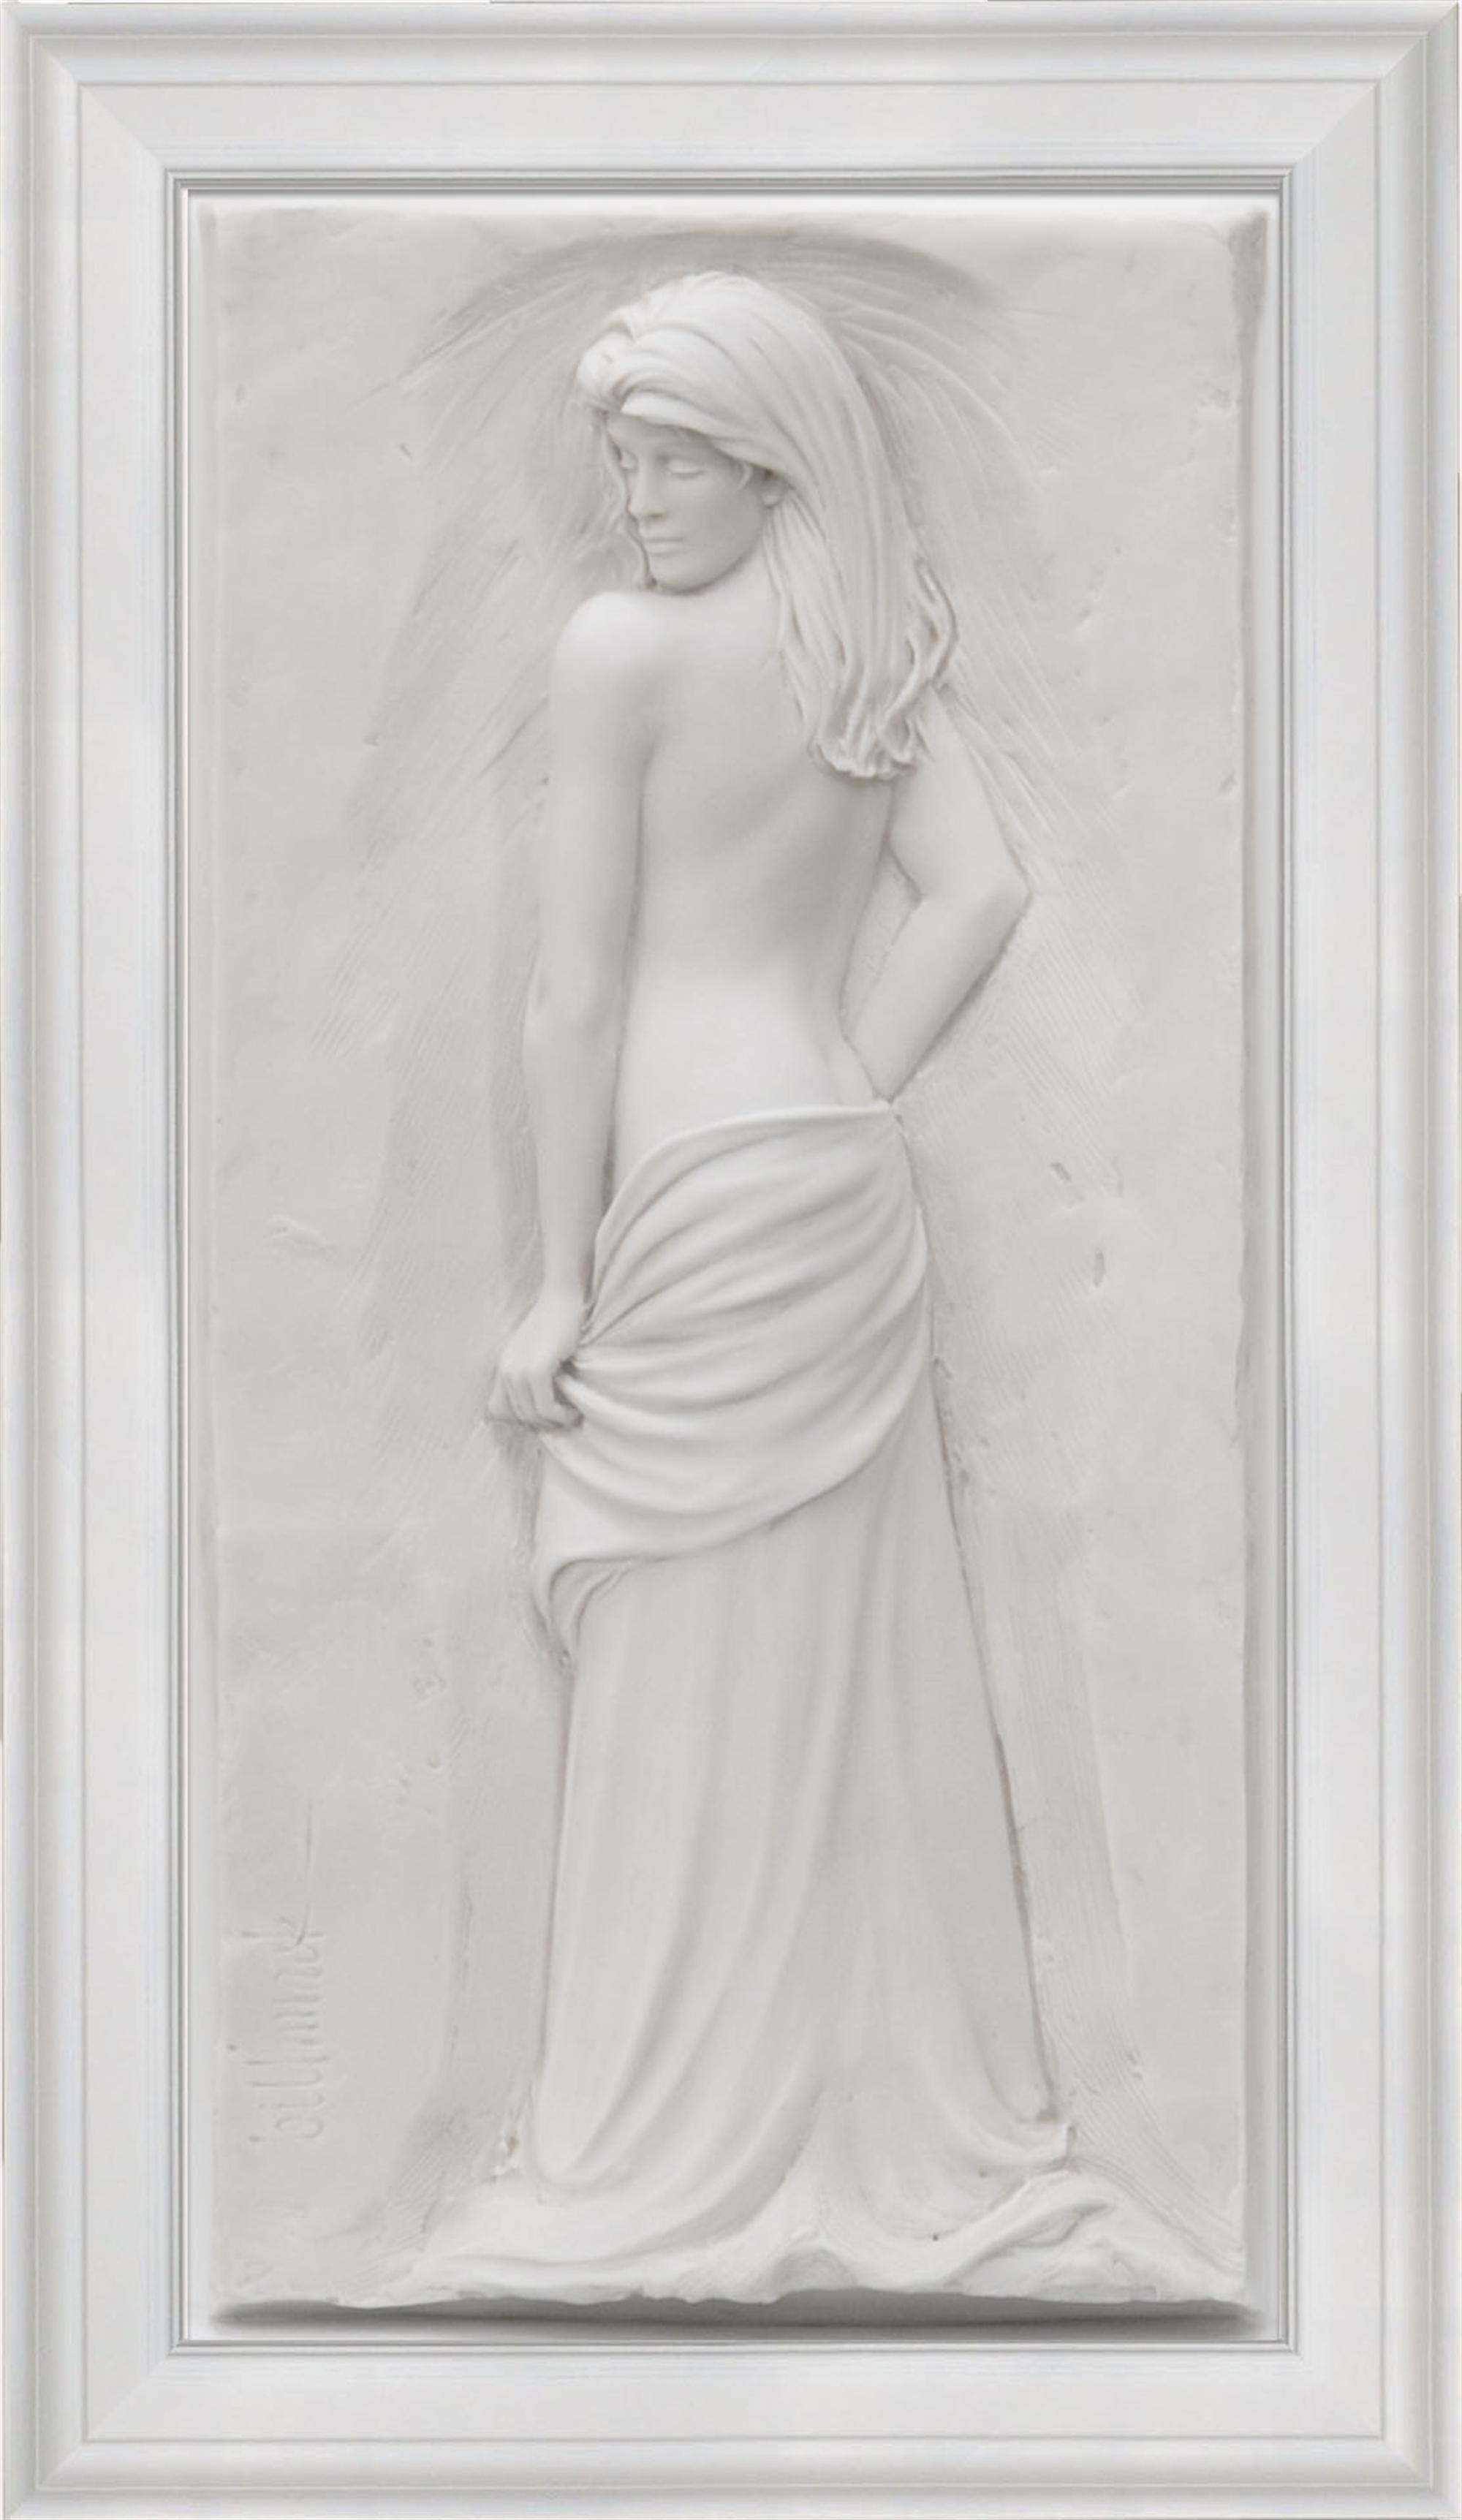 Elegance II by Bill Mack